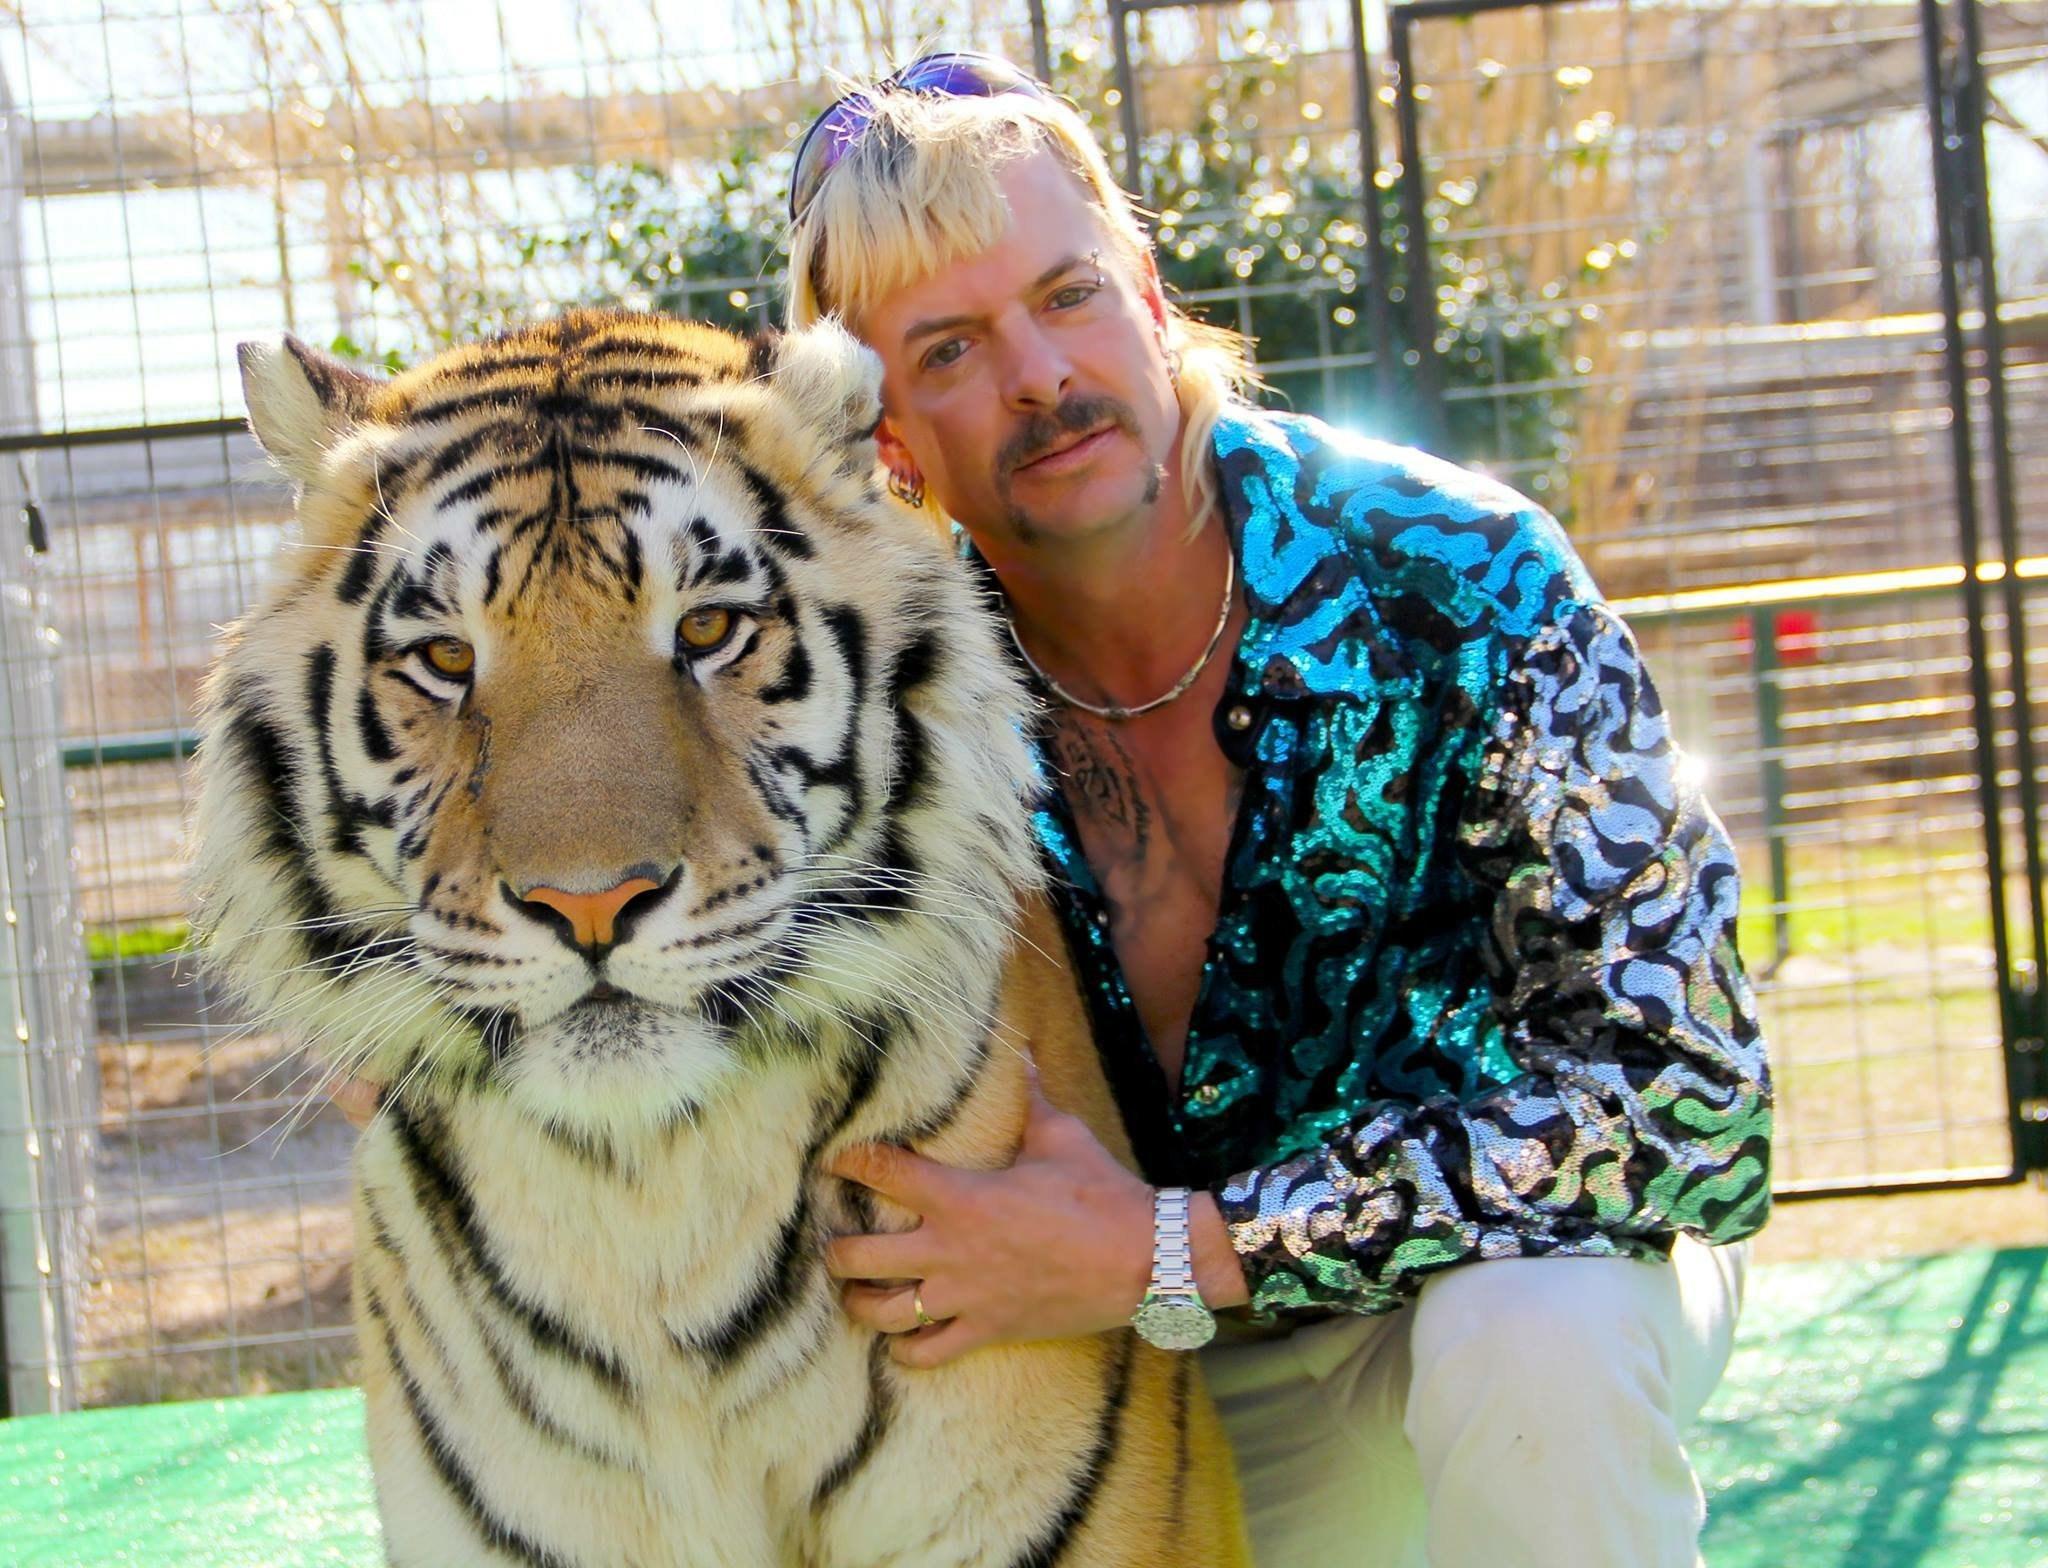 Netflix's Tiger King's Joe Exotic 'hospitalised for coronavirus'